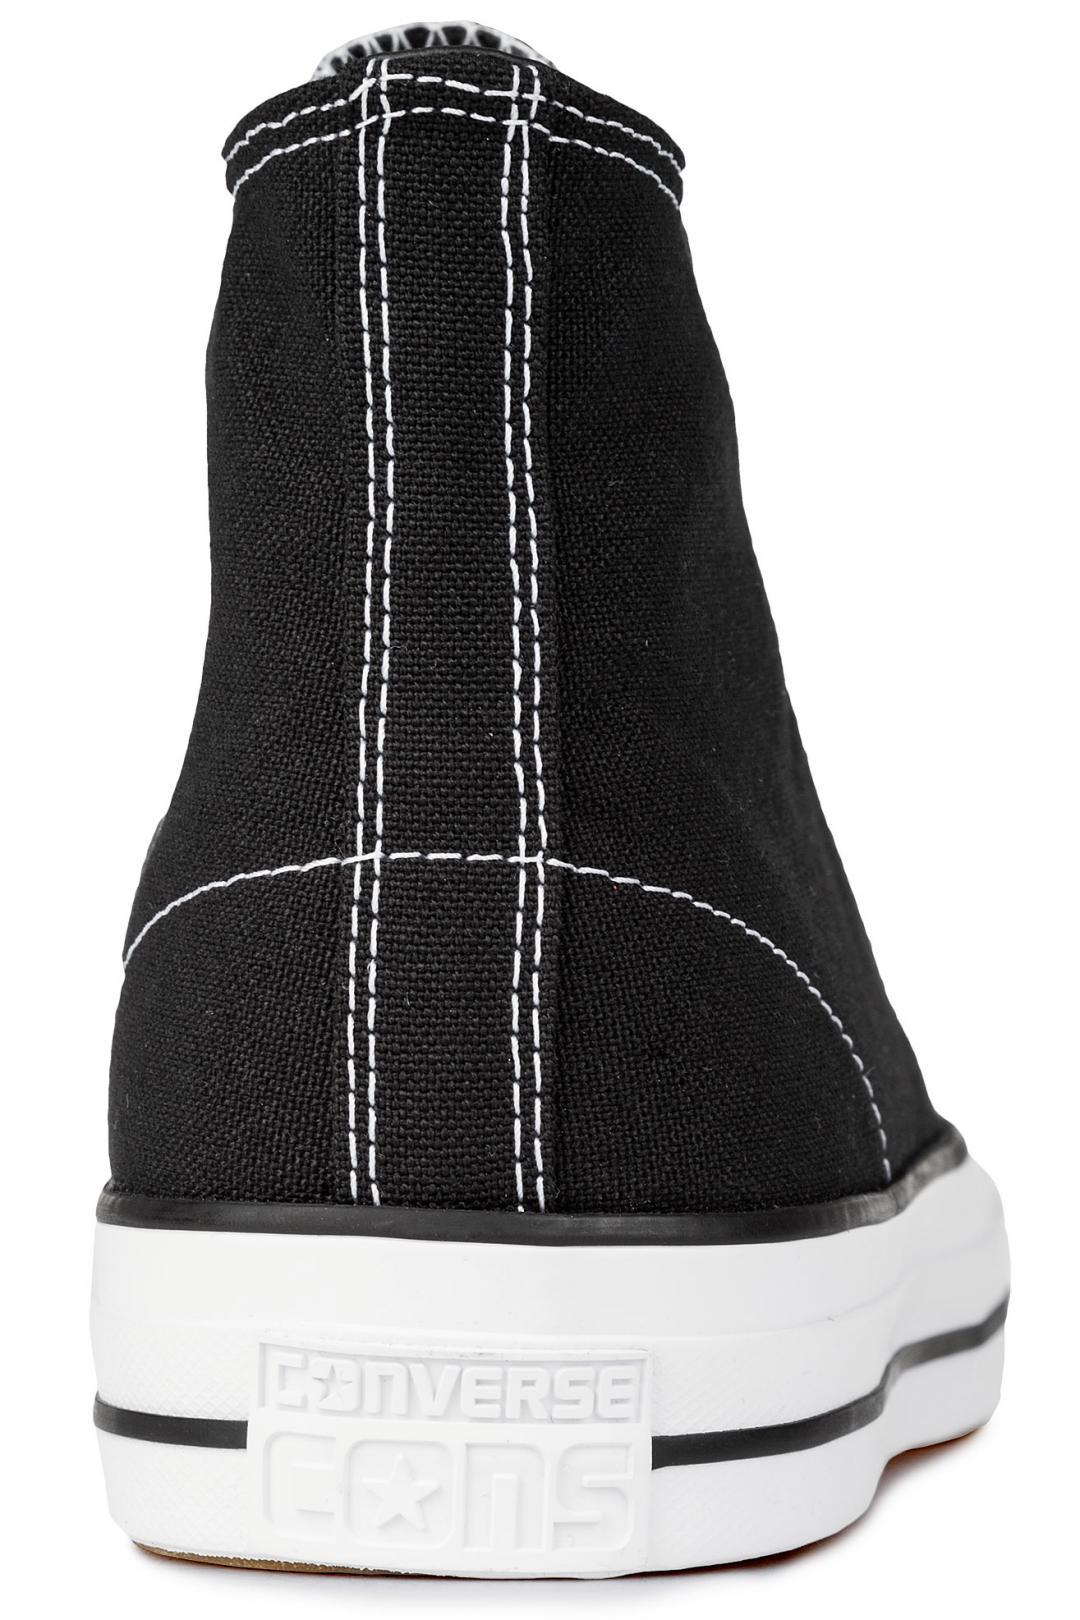 Uomo Converse CONS Chuck Taylor High All Star Pro black black white white | Sneaker